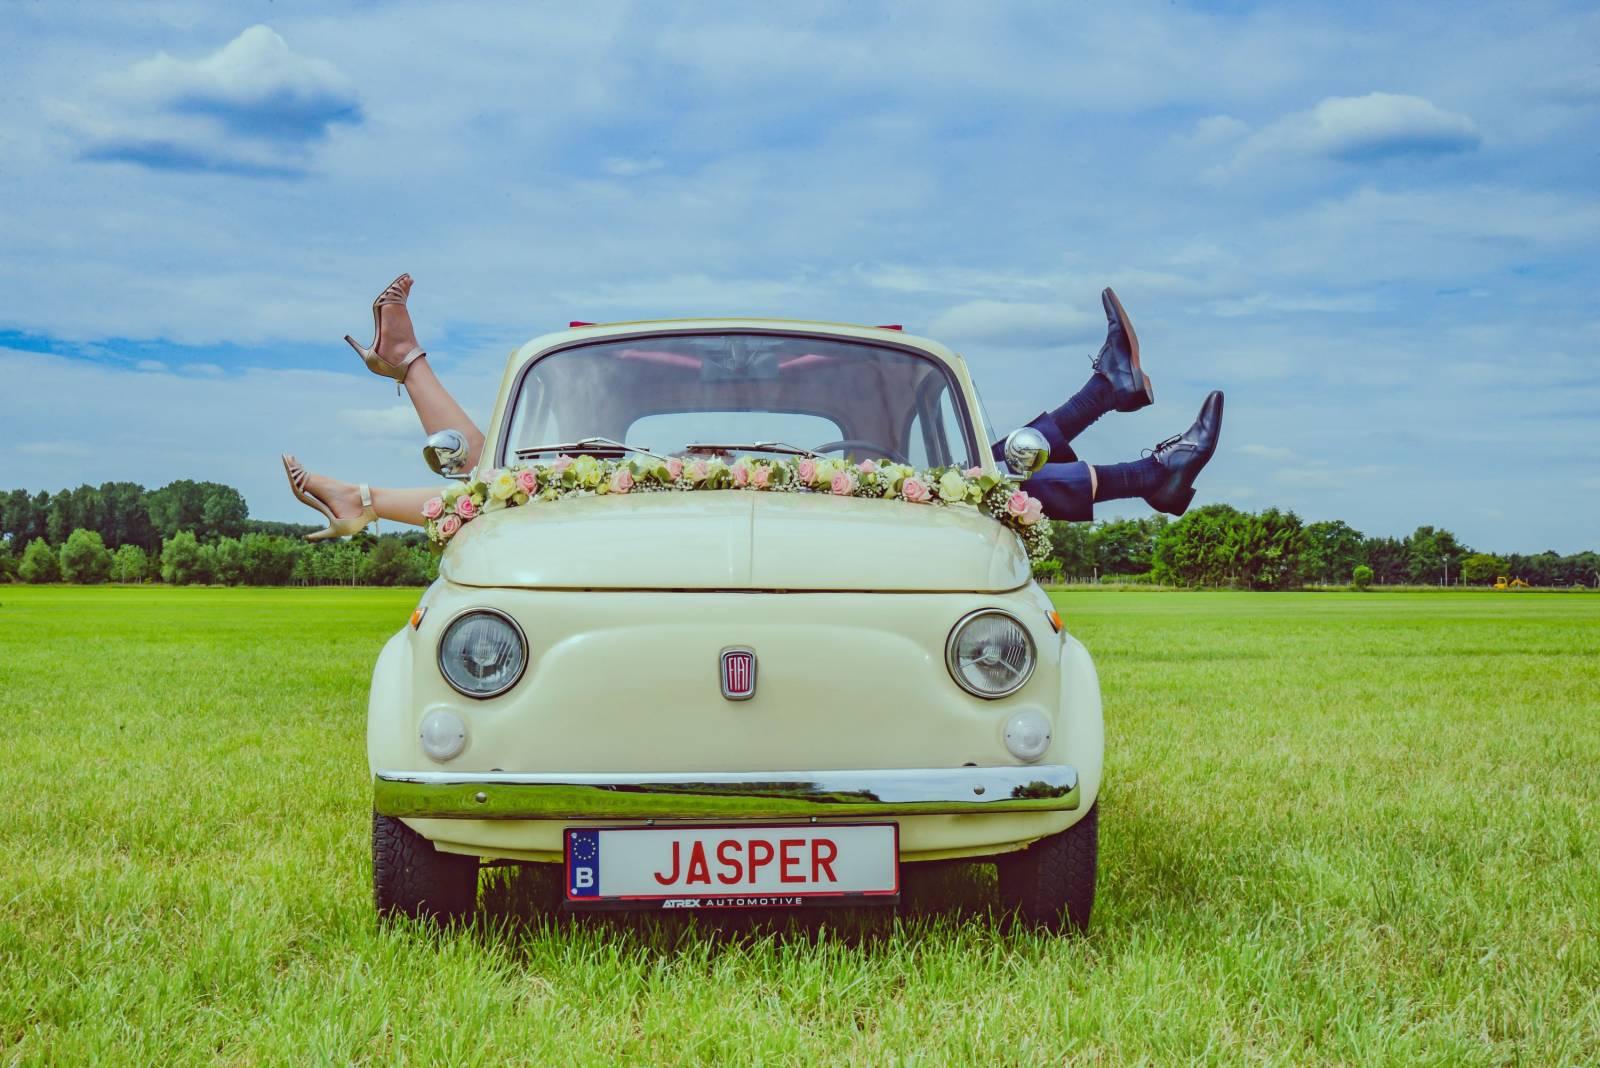 Carpe Diem Bloemen & Decoratie - House of Weddings  - 10